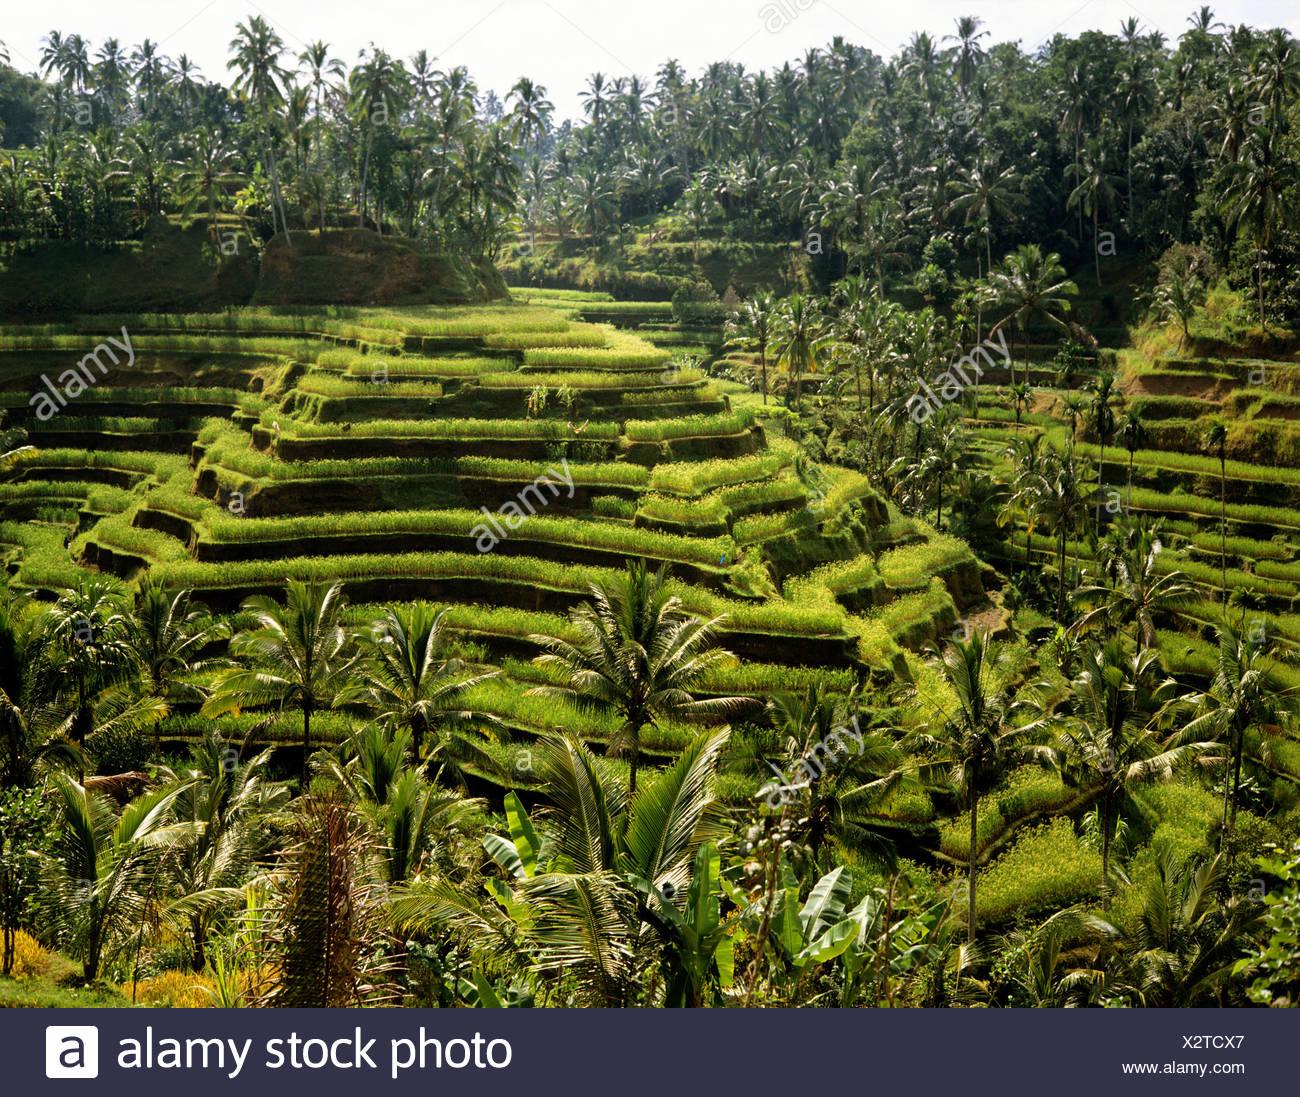 Arrozales cerca de Ubud, Bali, Indonesia, en el sudeste de Asia Imagen De Stock